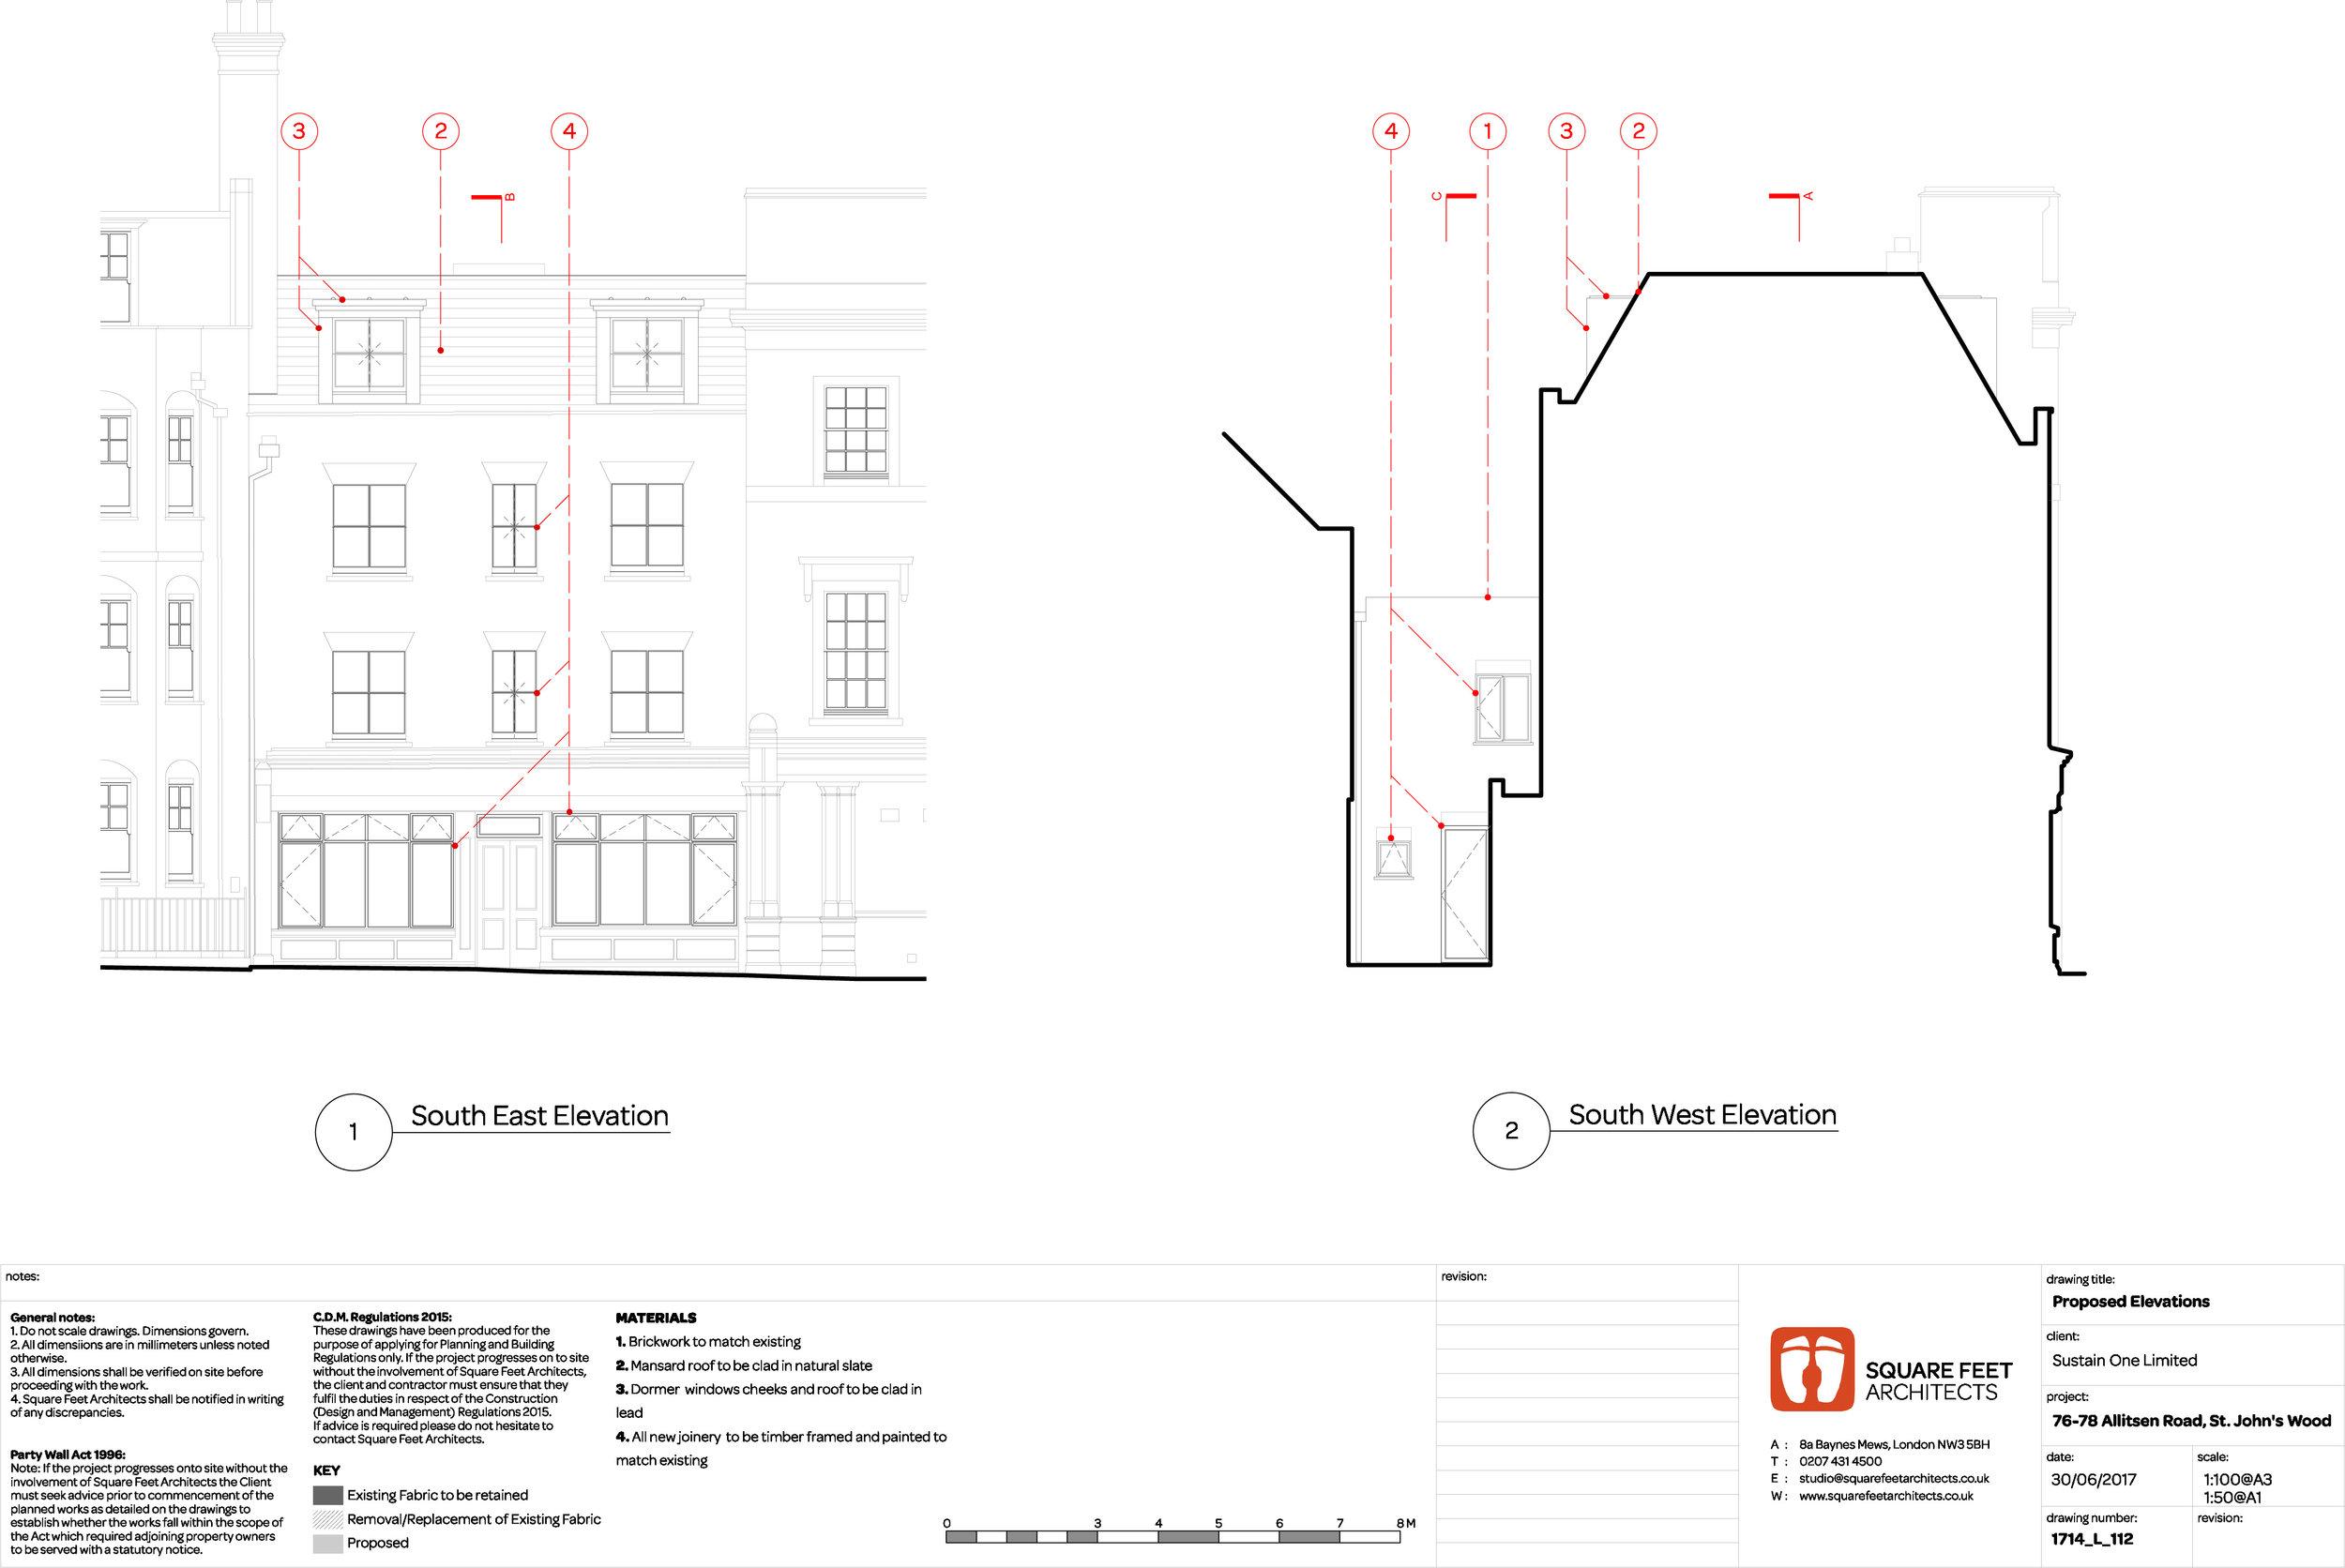 1714_L_112-Proposed Elevations.jpg